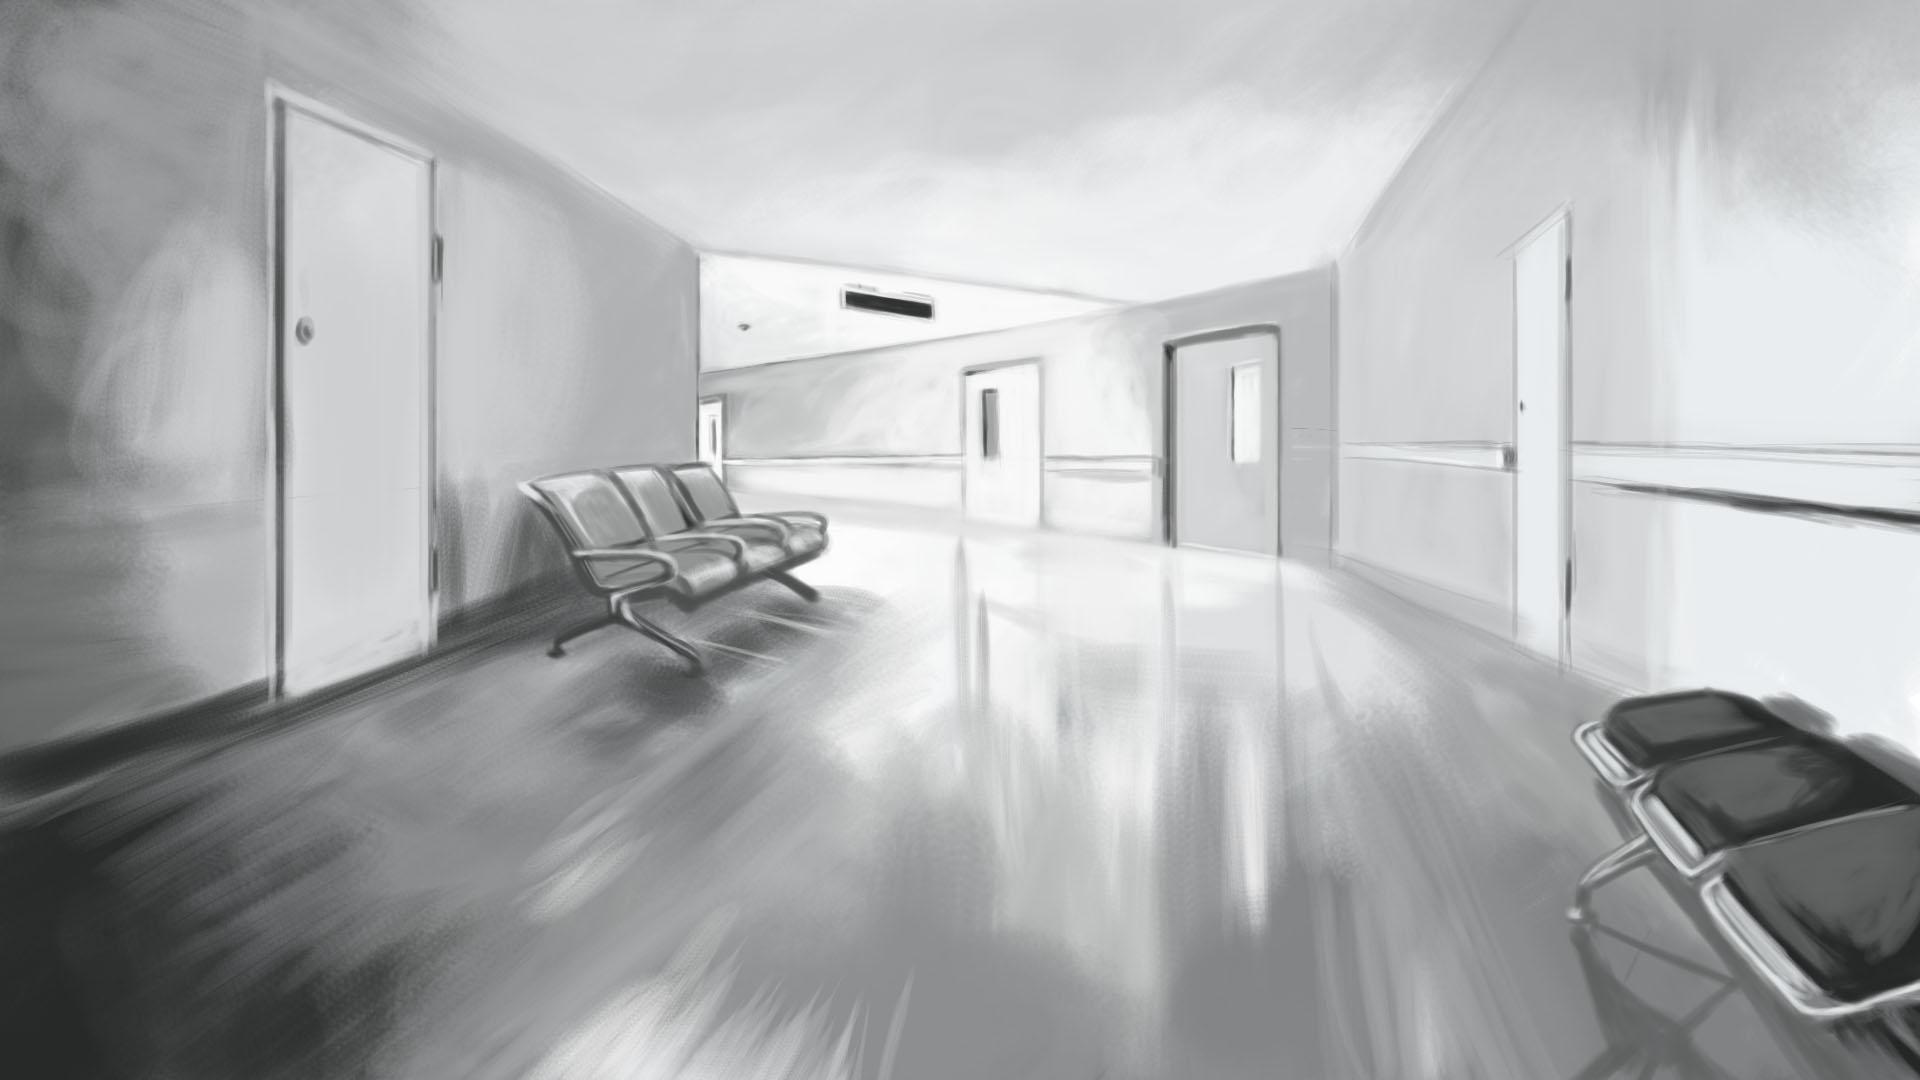 hospitalscene